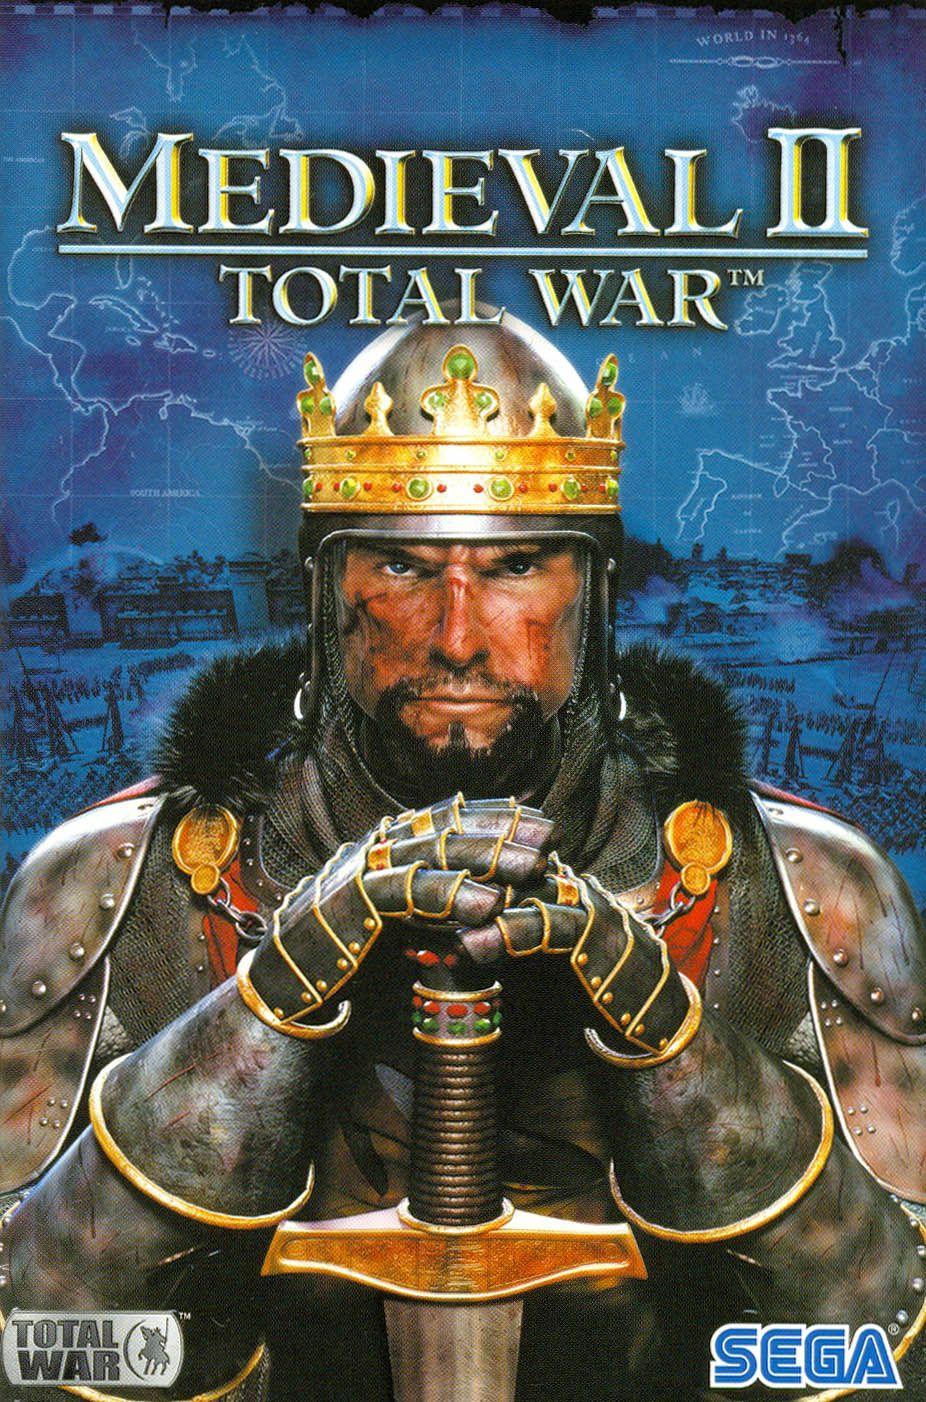 Medieval II Total War Total war, War, Game codes